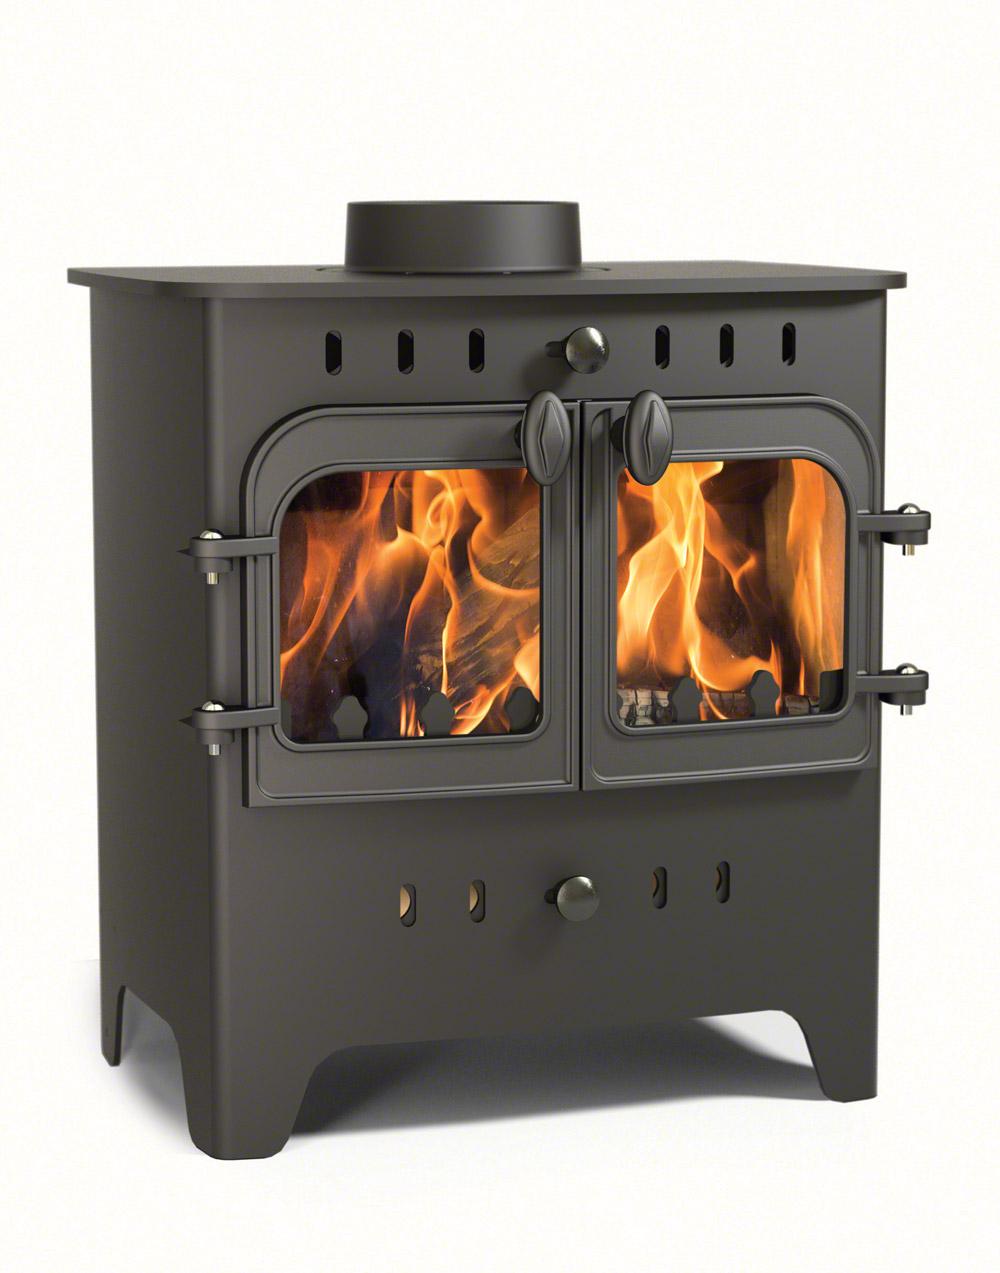 electric stove villager electric stove rh electricstovekiganari blogspot com